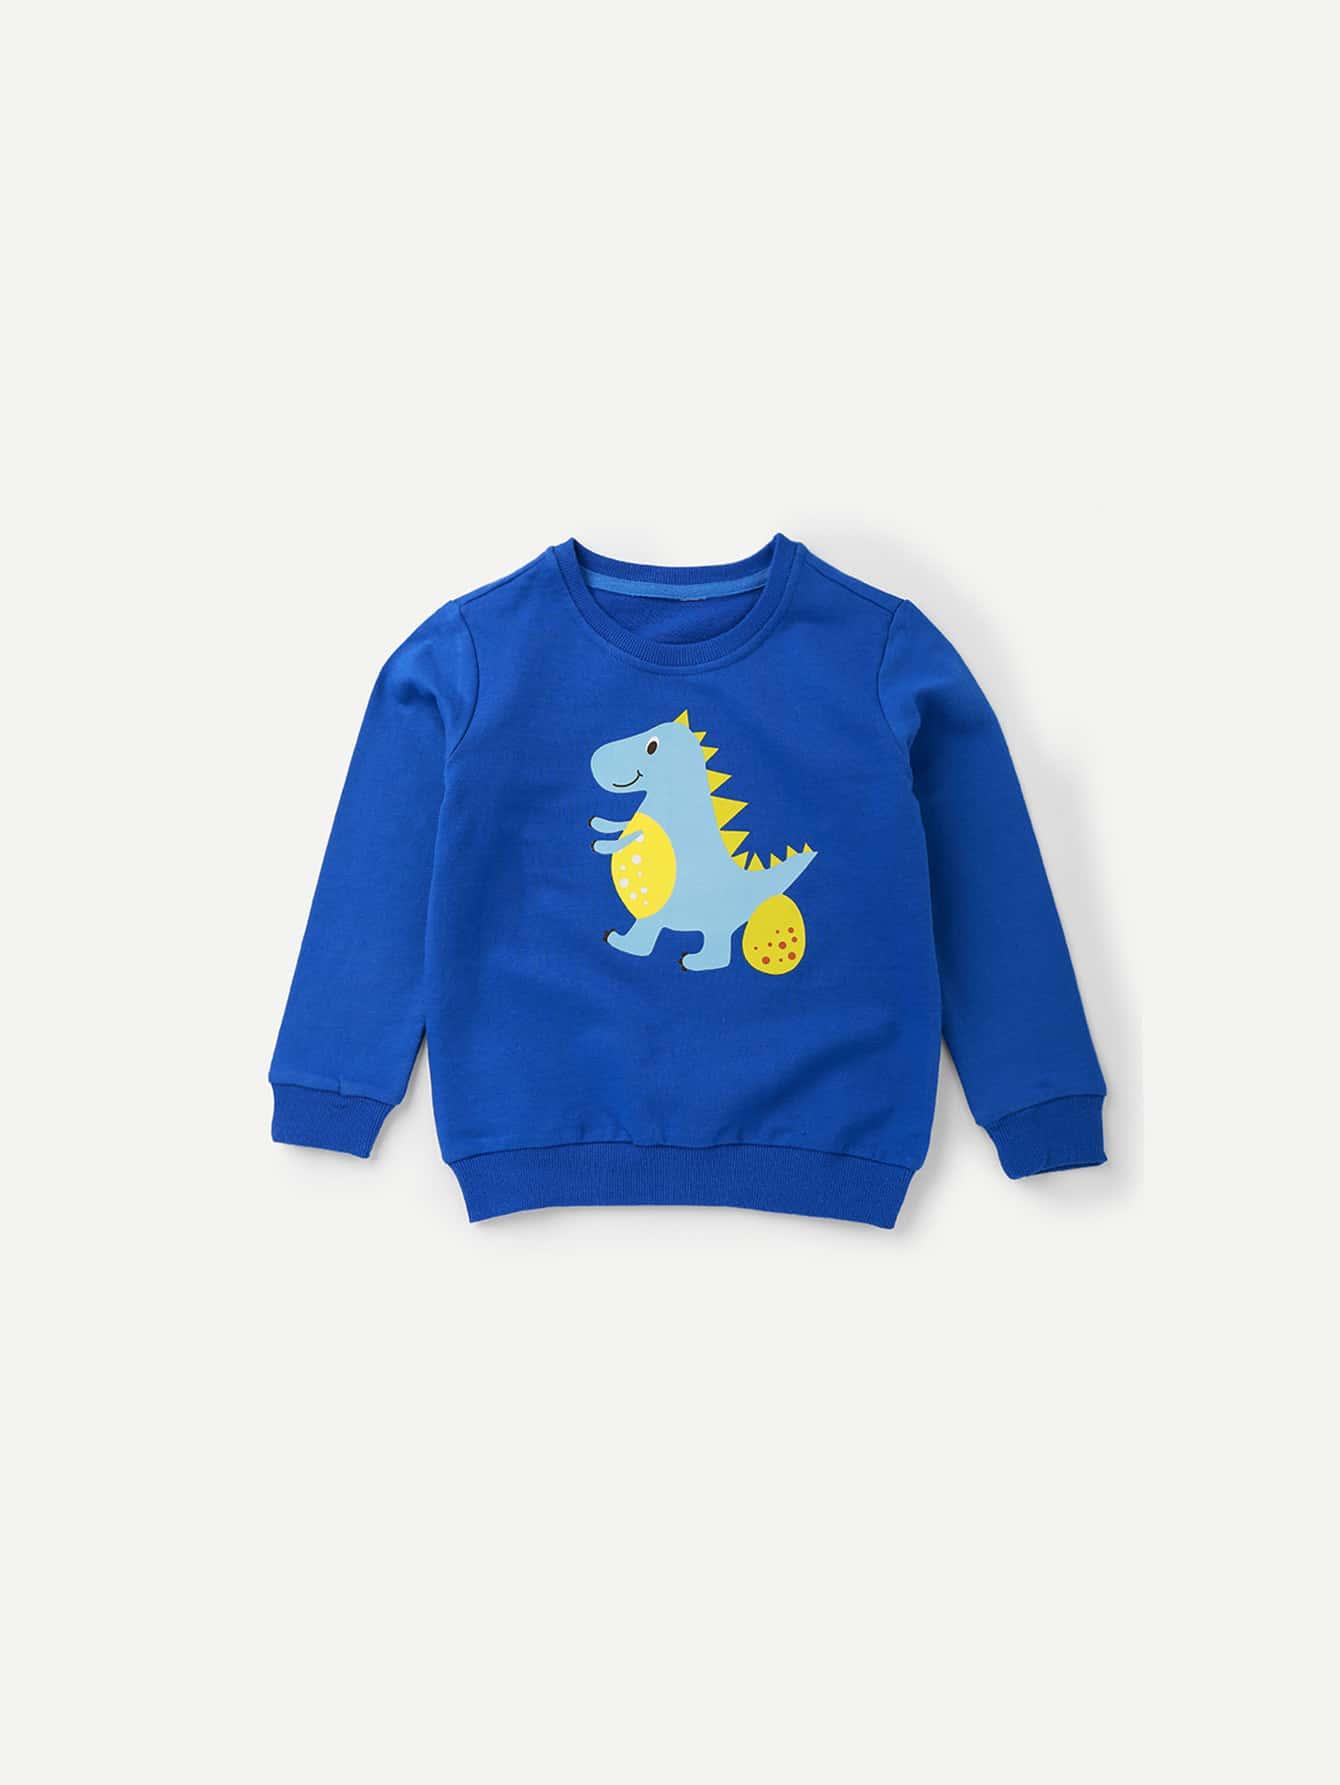 Boys Dinosaur Print Sweatshirt